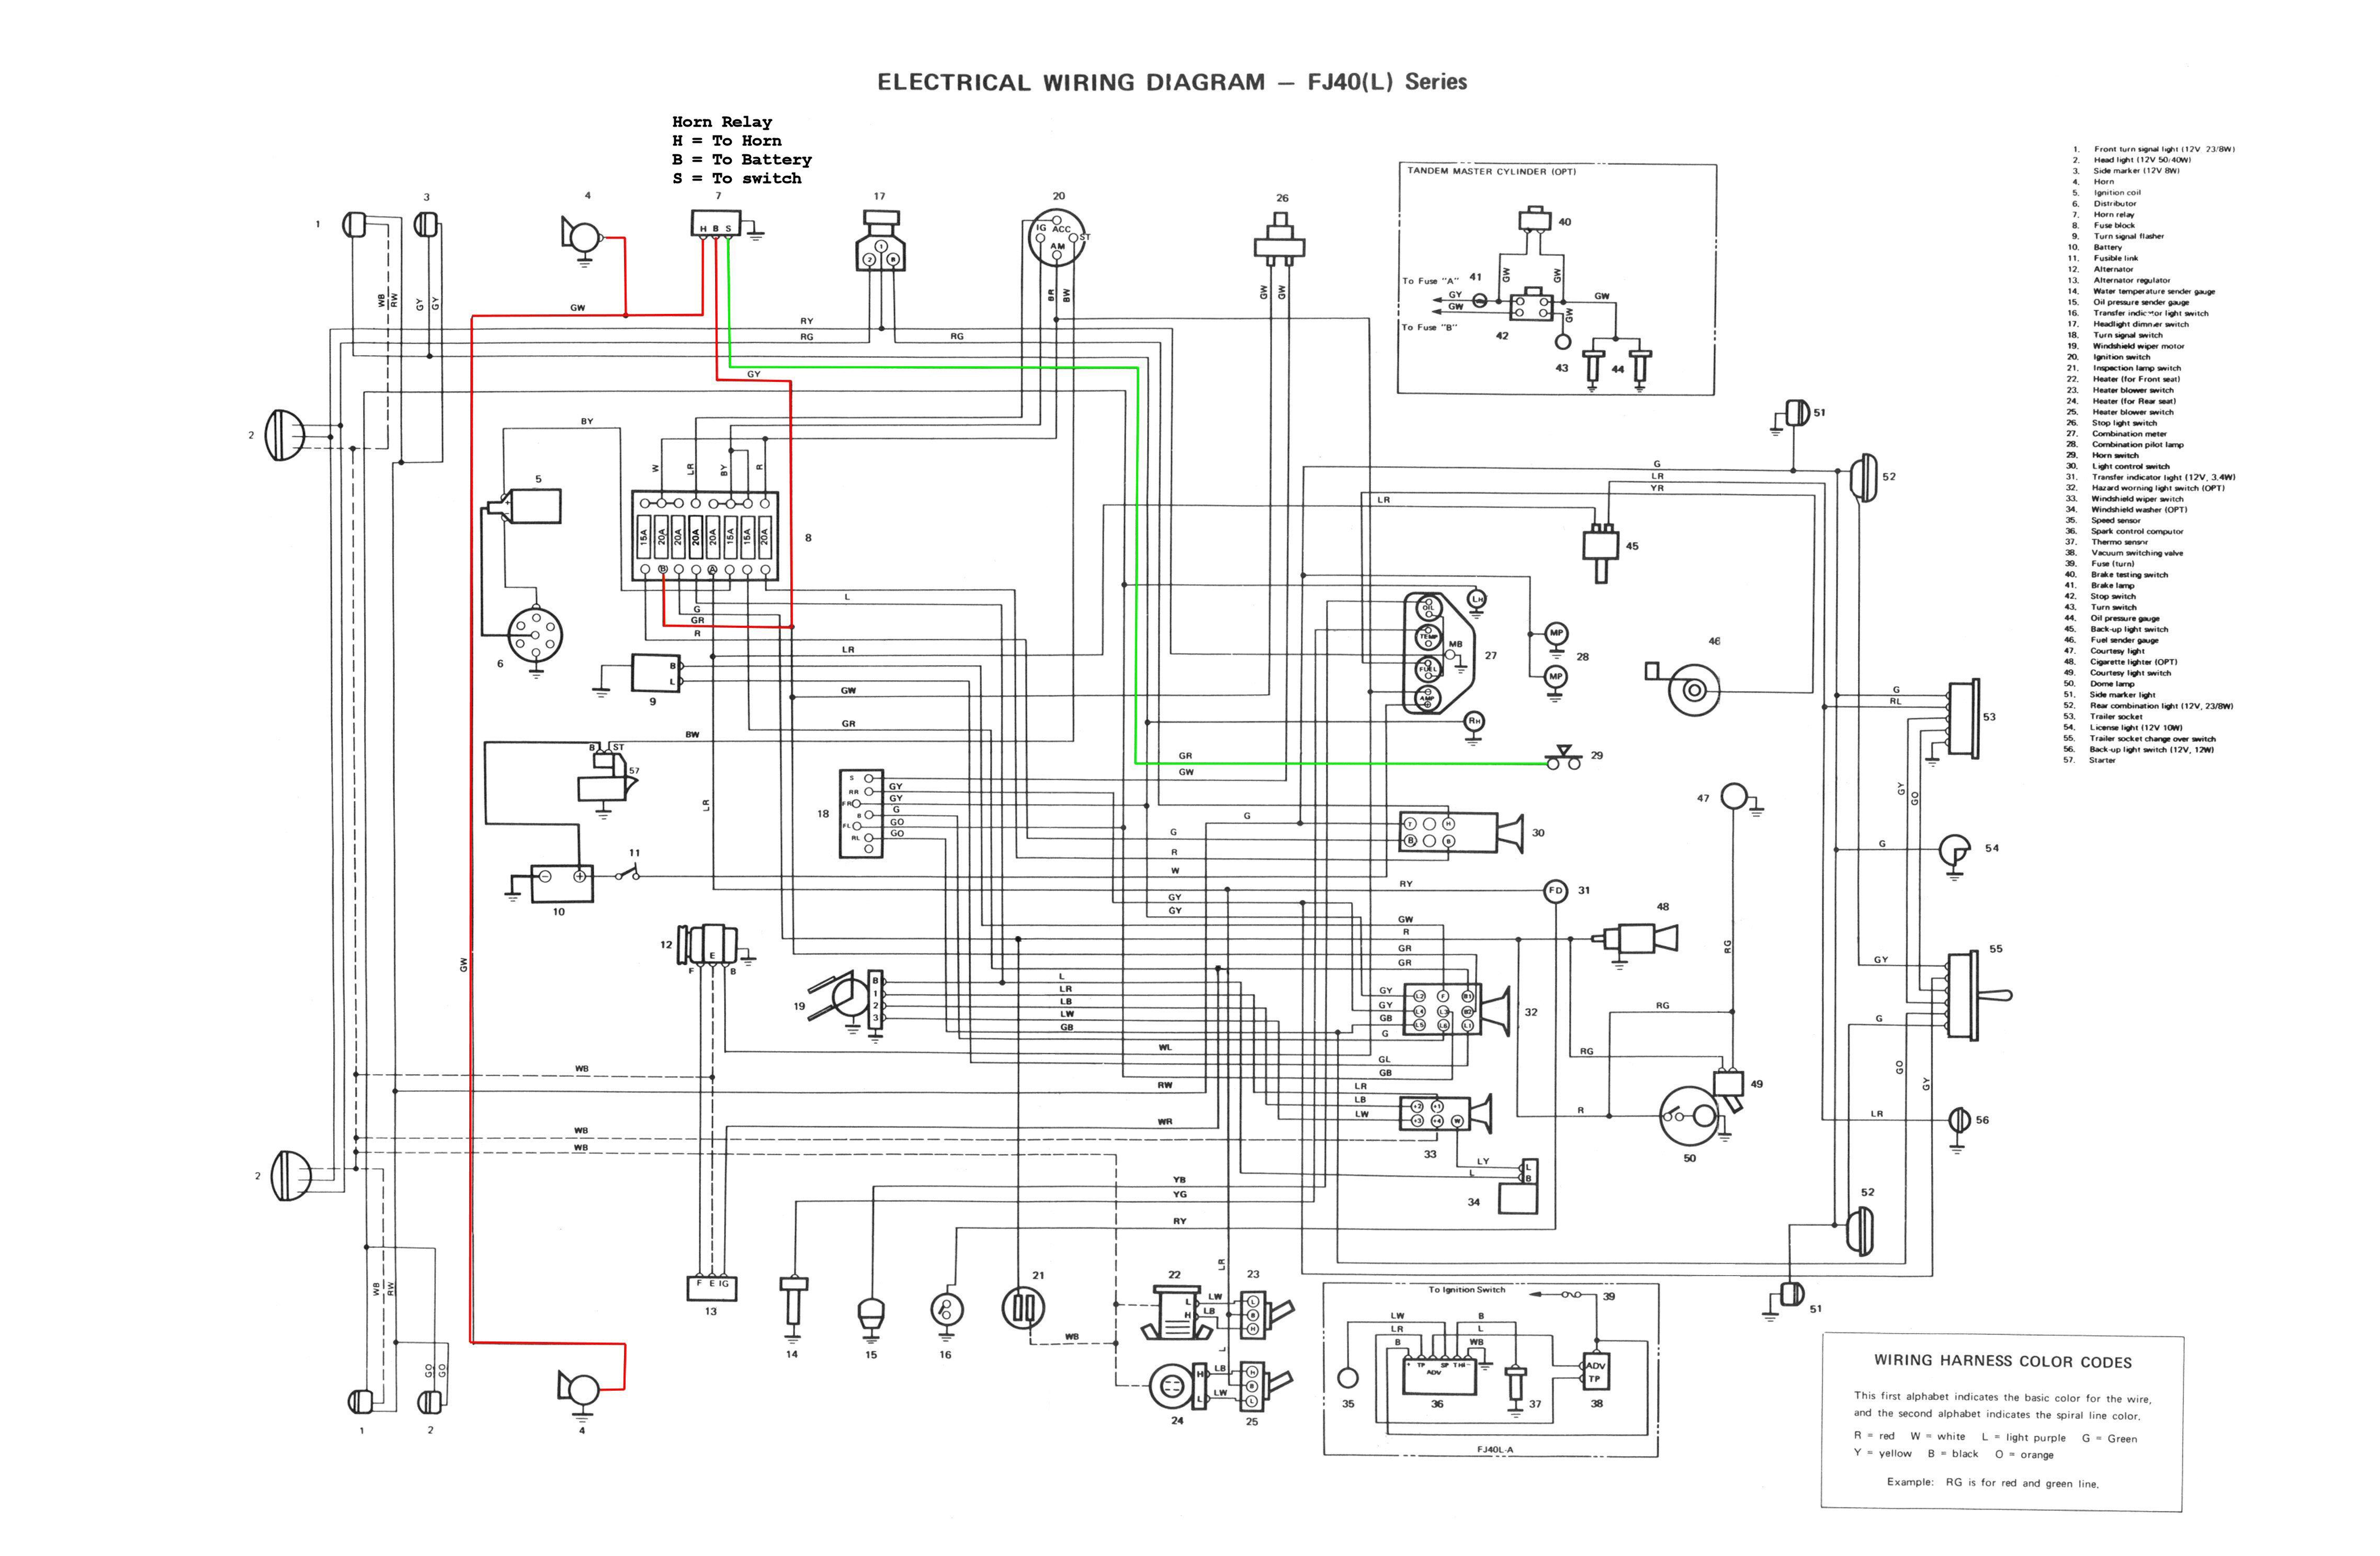 toyota land cruiser 1996 electrical wiring diagram ez go golf cart utility box horn troubleshooting